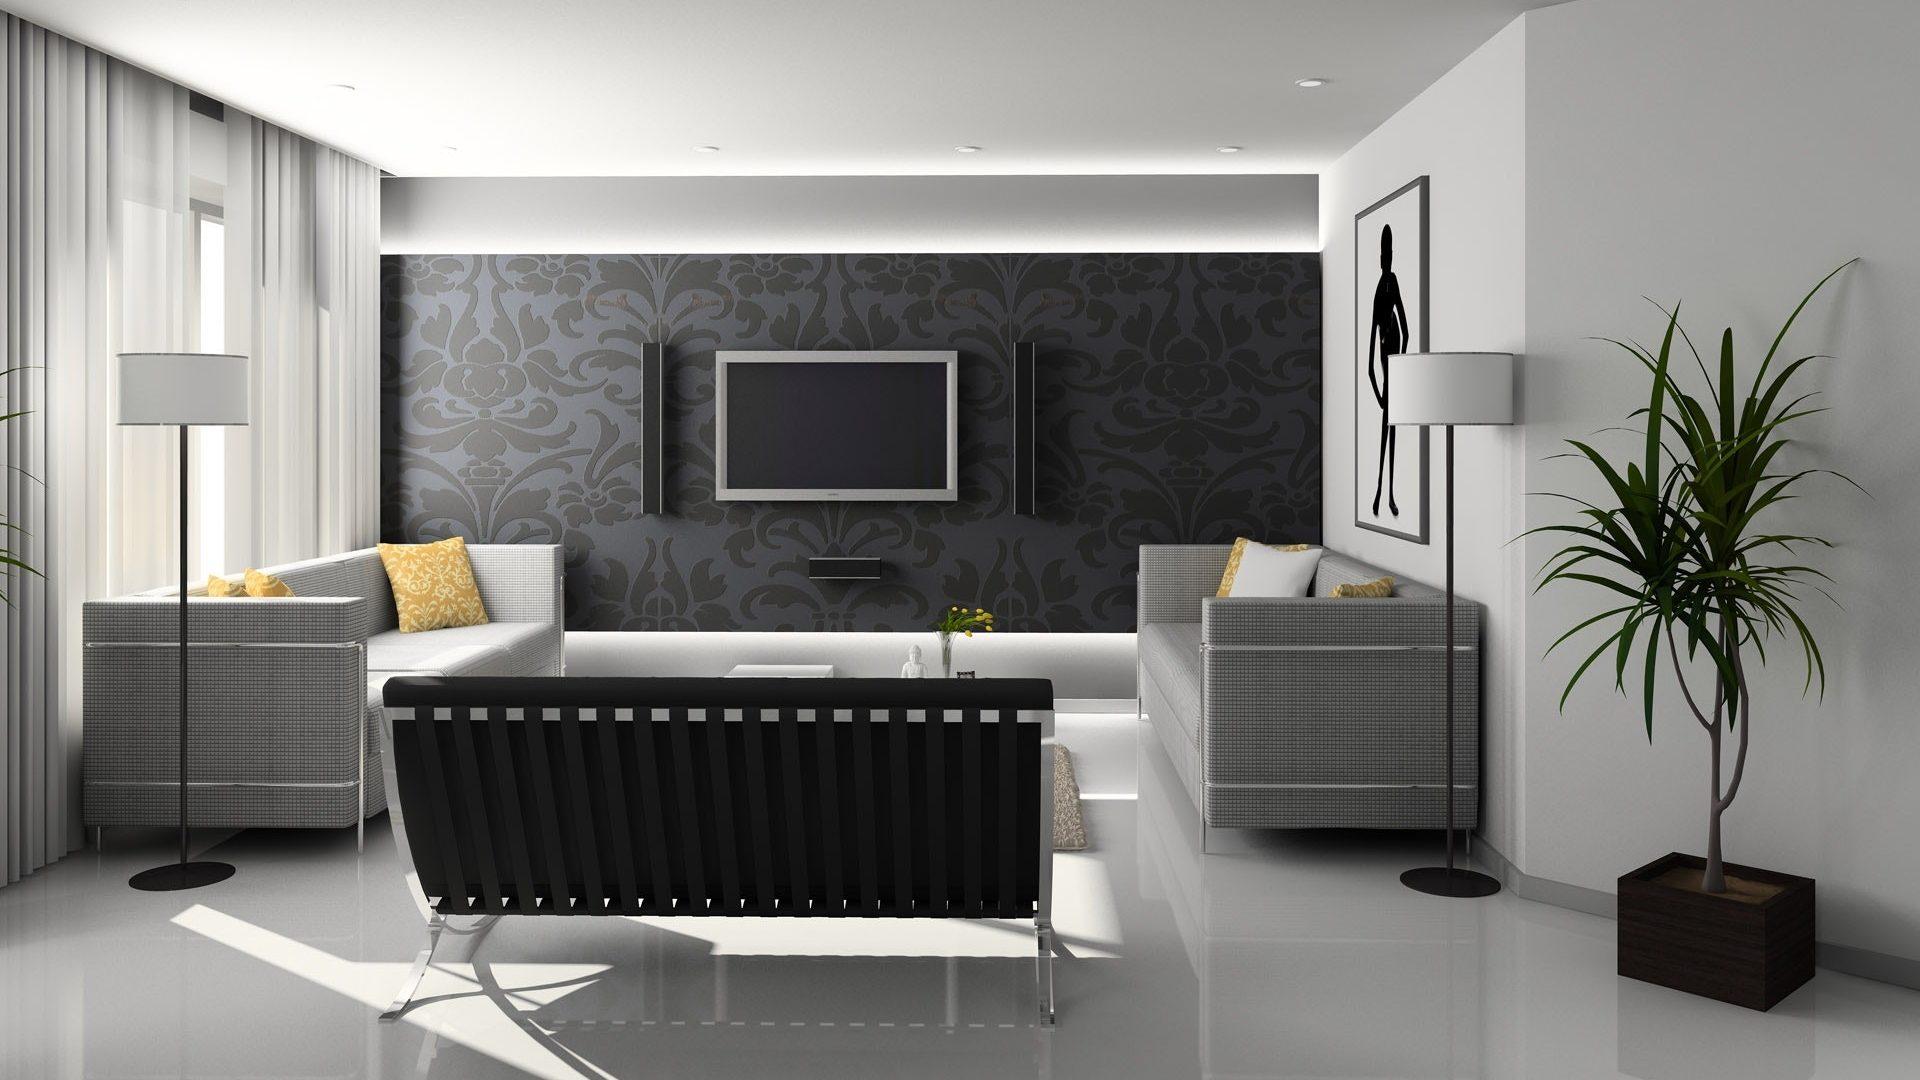 Luxury autocad design